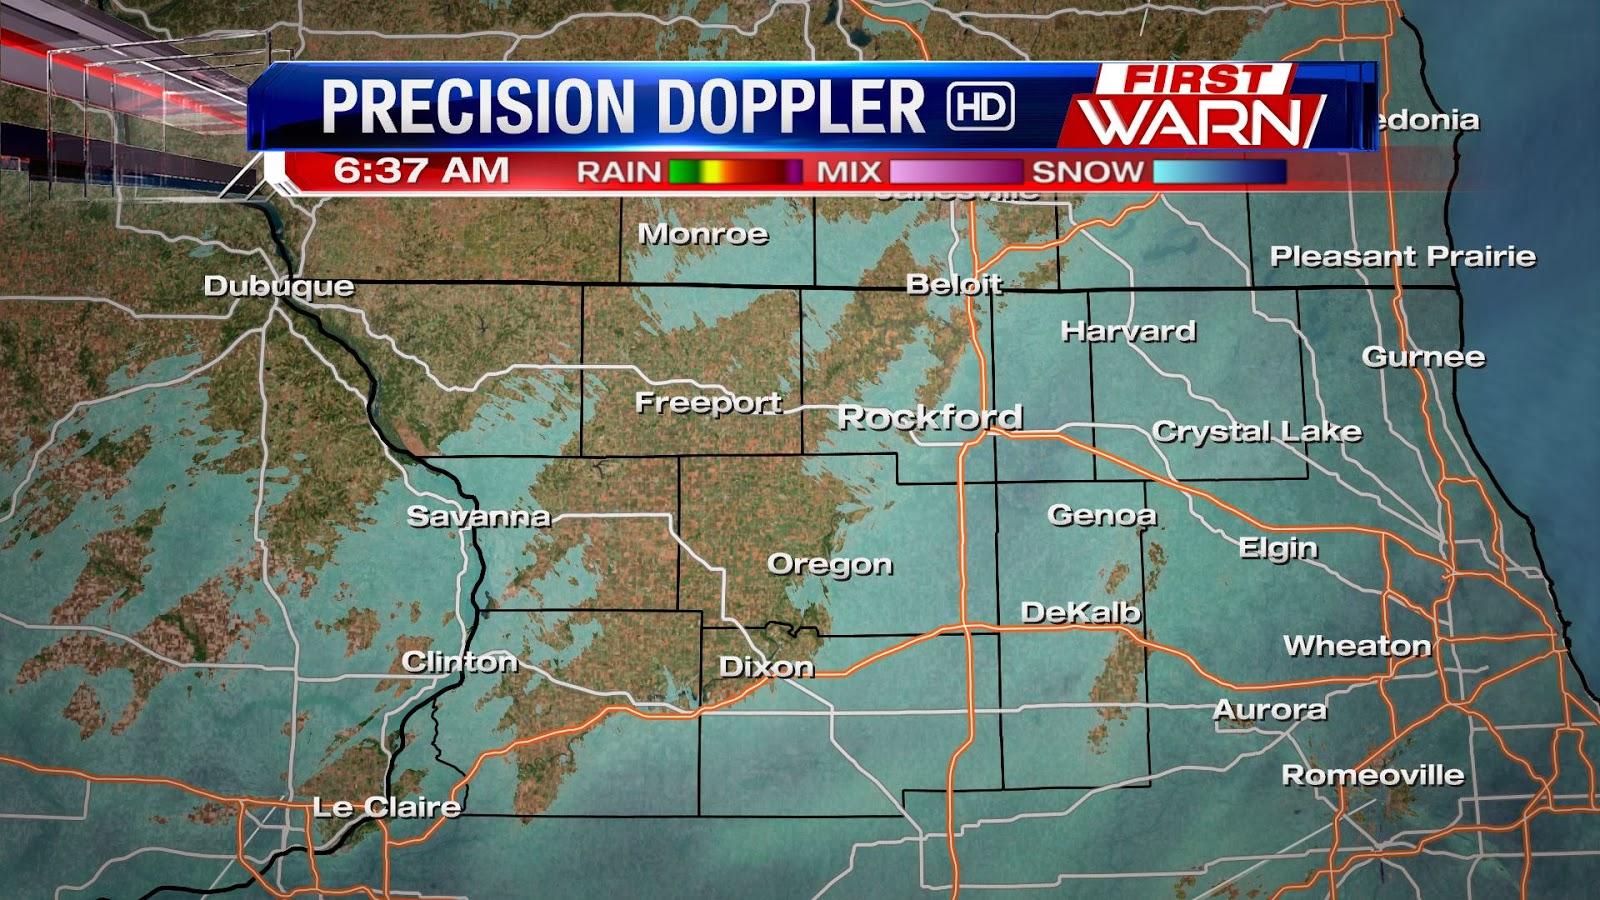 First Warn Weather Team: Wednesday morning snow update